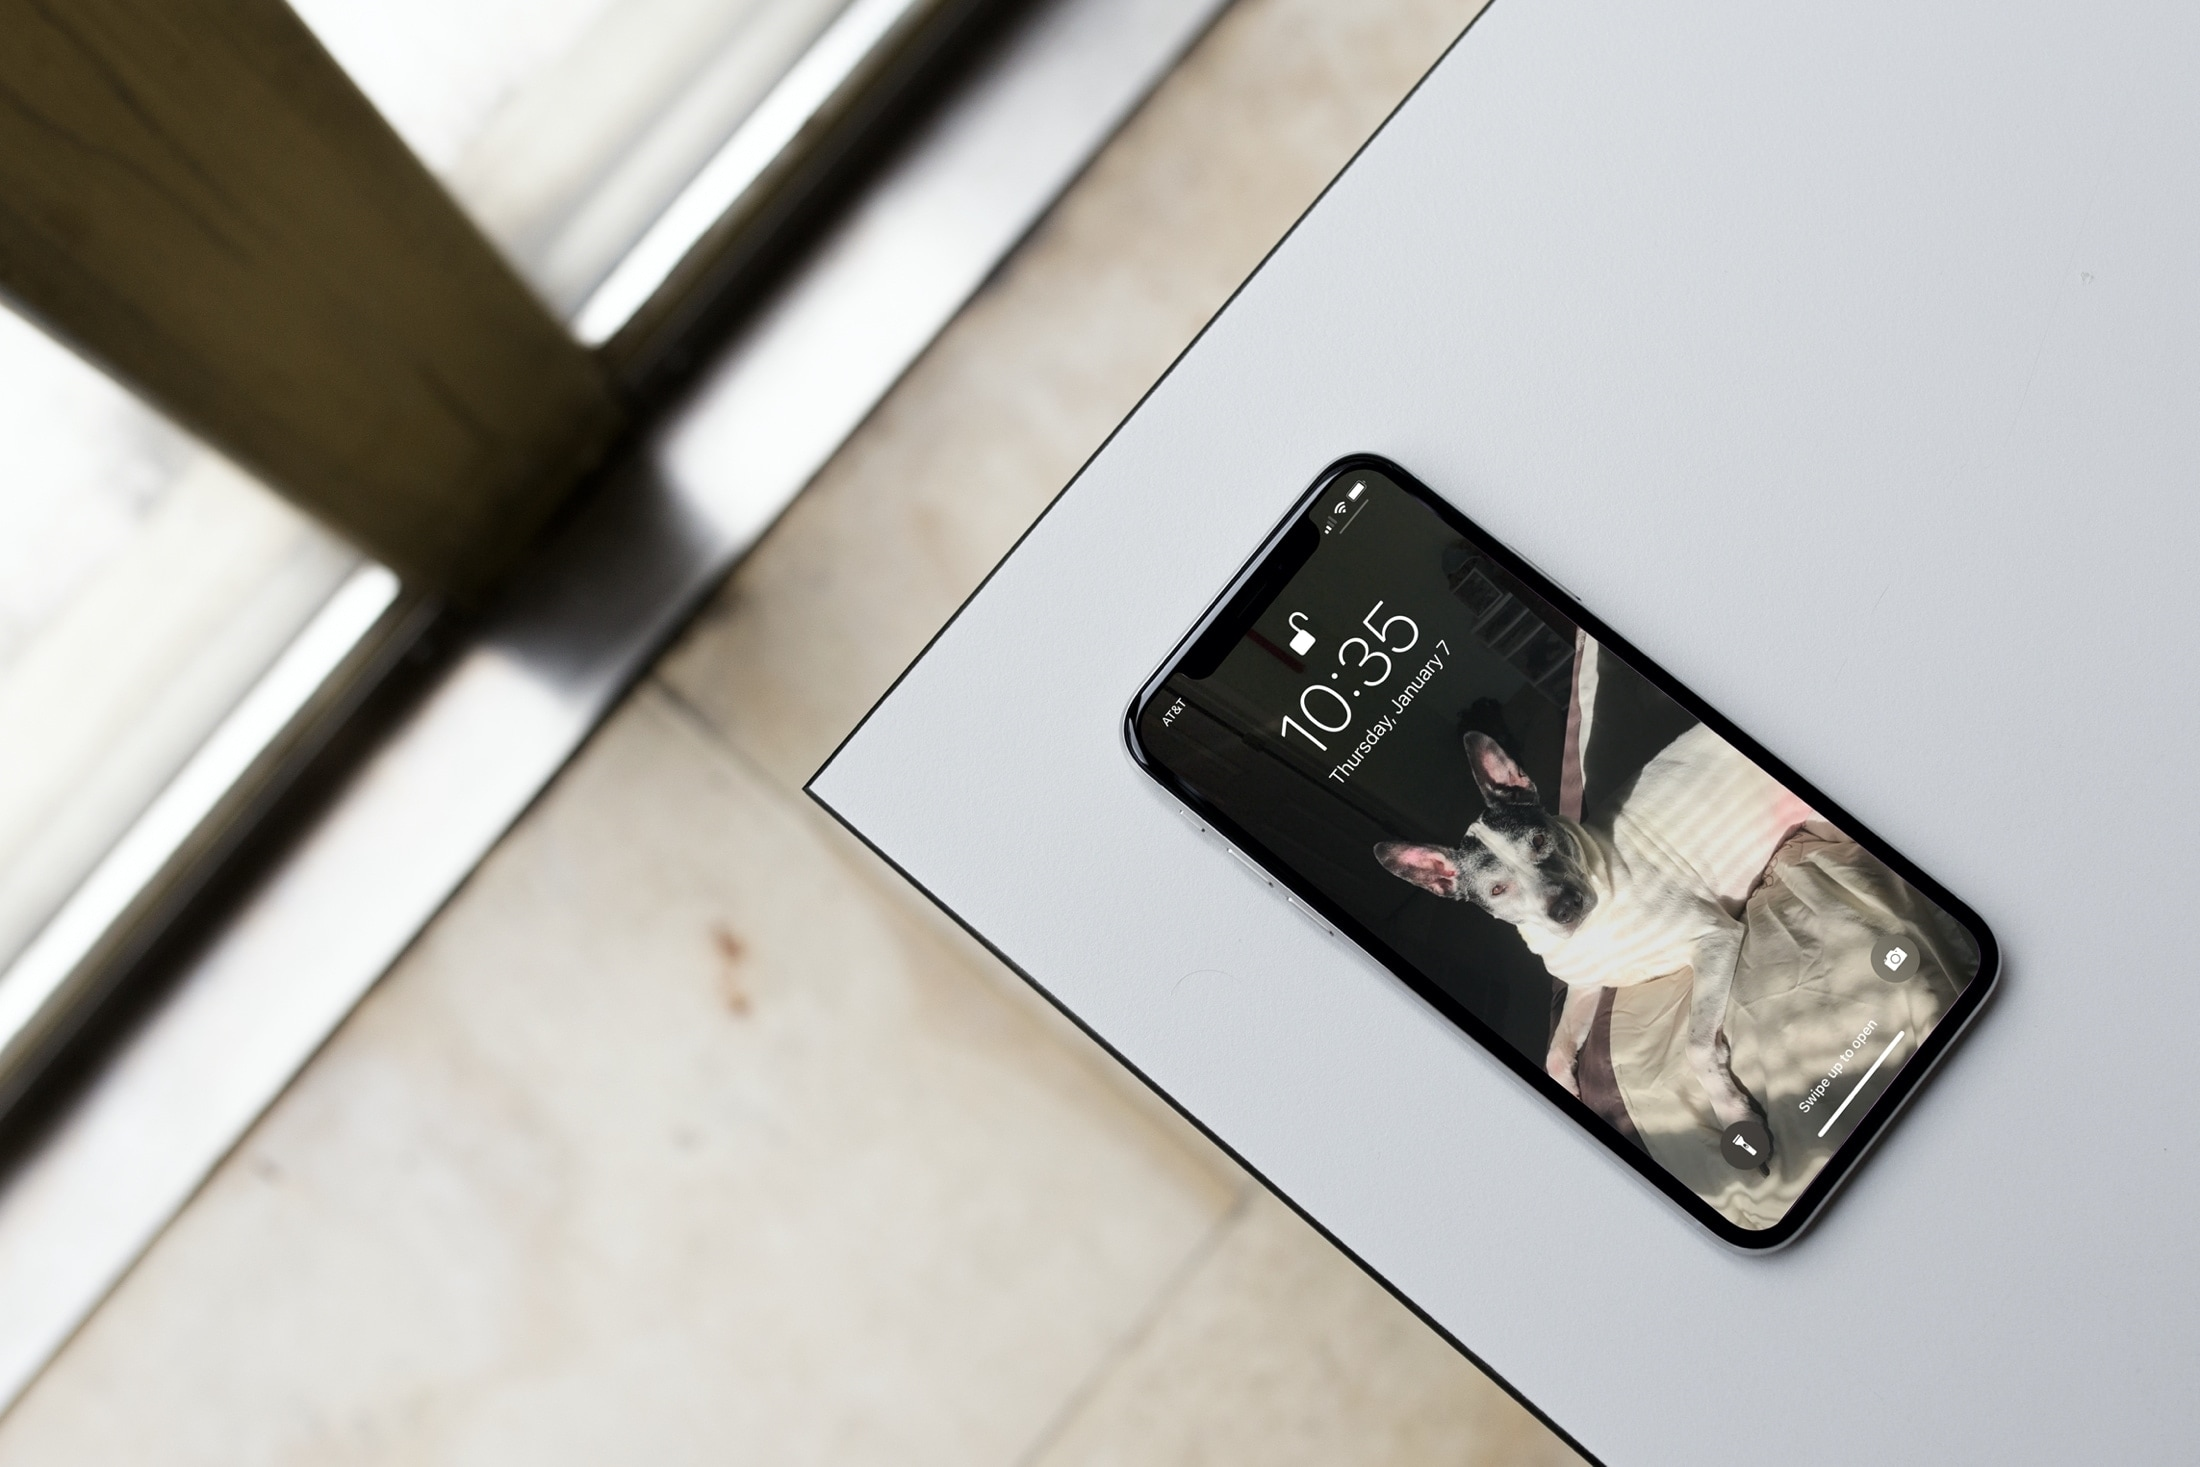 Lock Screen on iPhone 12 on Table